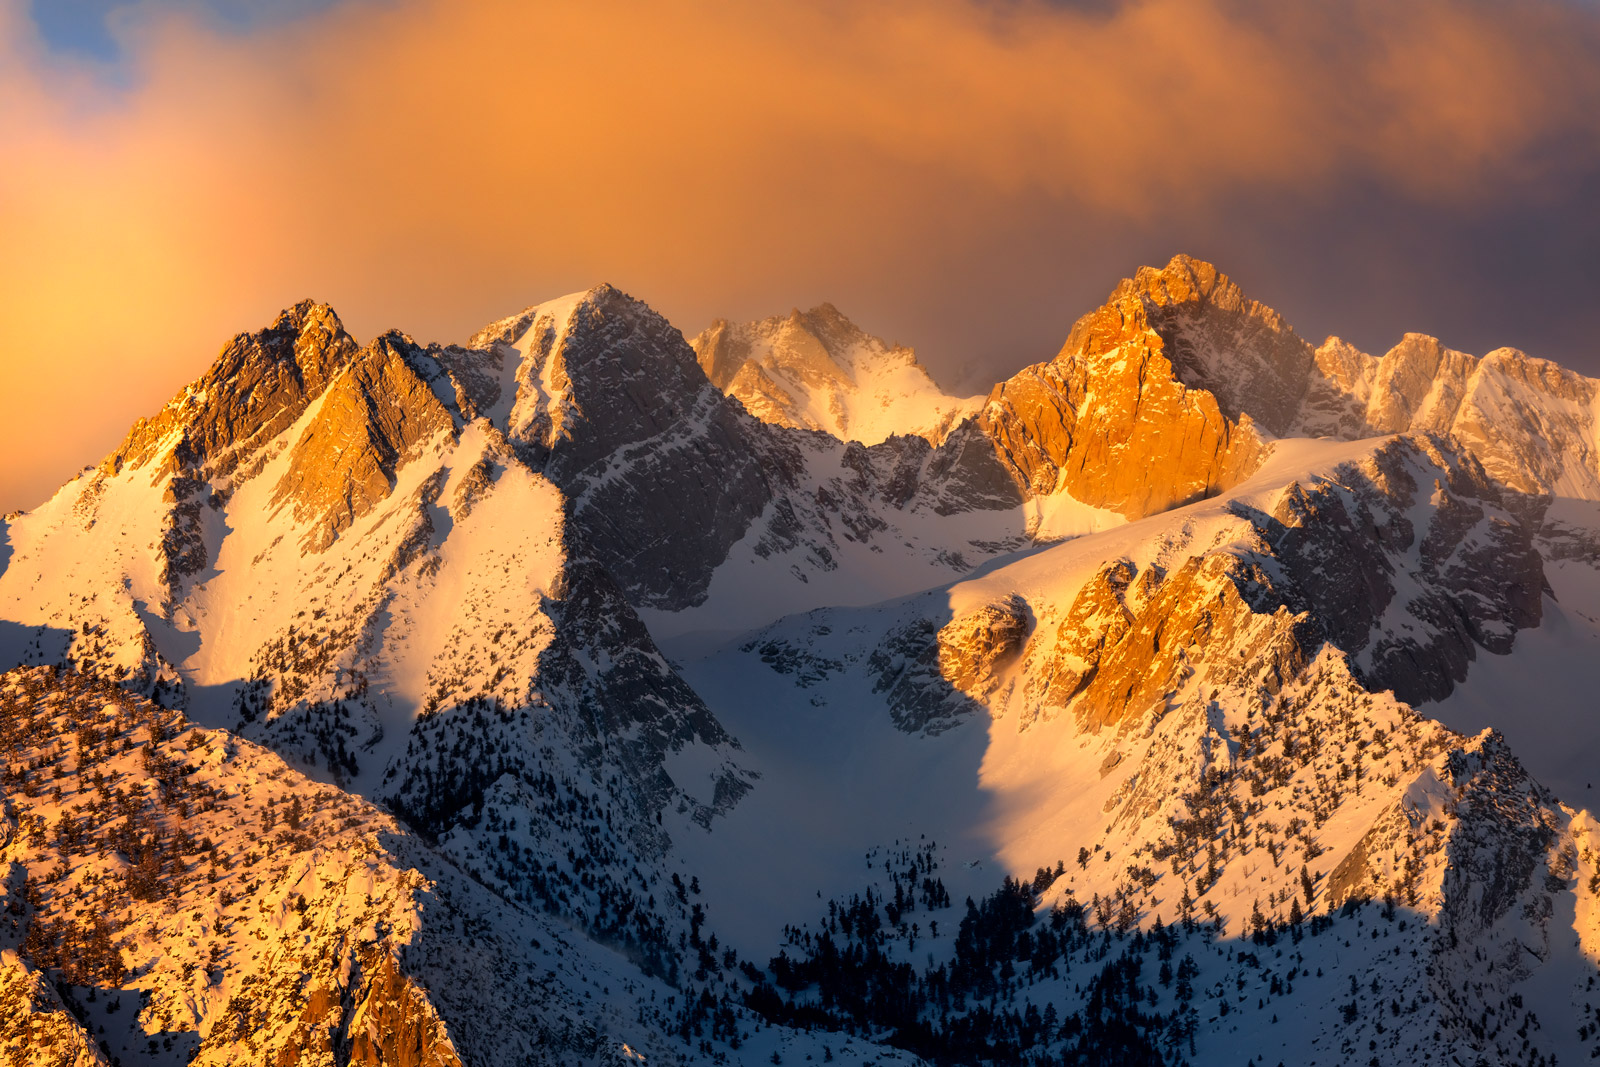 California, Eastern Sierra, Winter, Sunrise, Mountain, photo